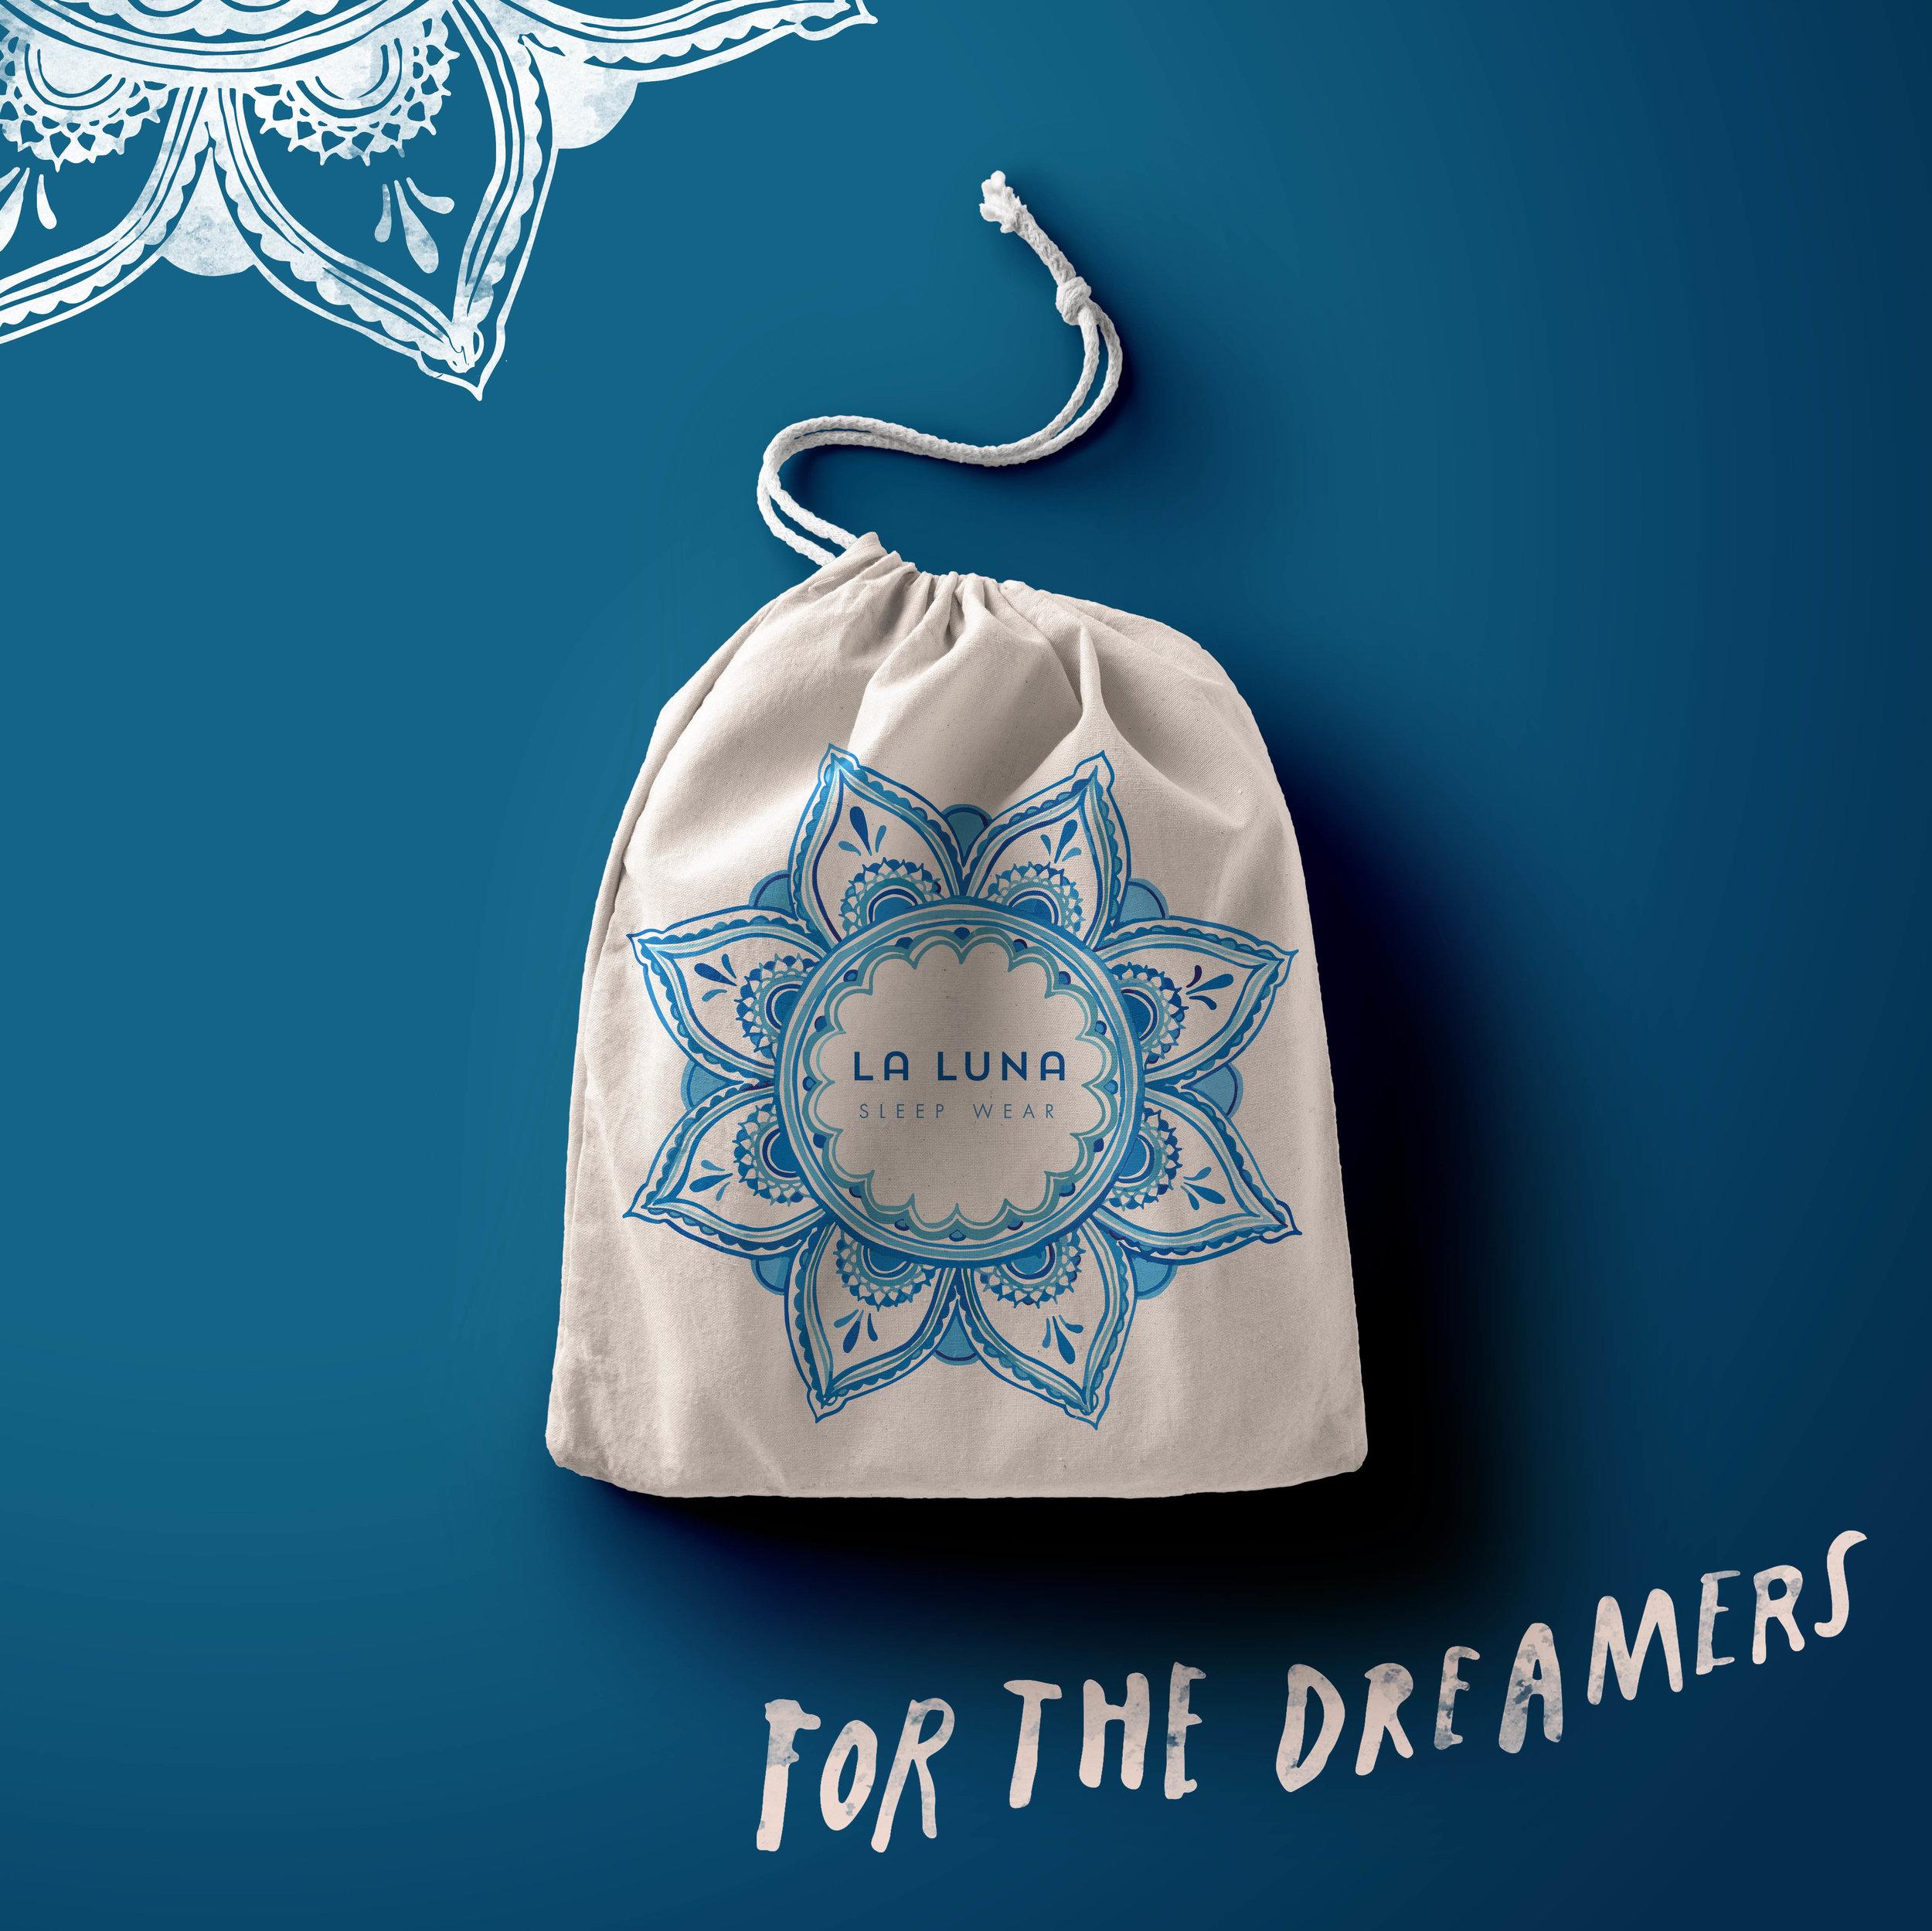 Blue La luna logo printed on small canvas bag with intricate mandala surrounding words